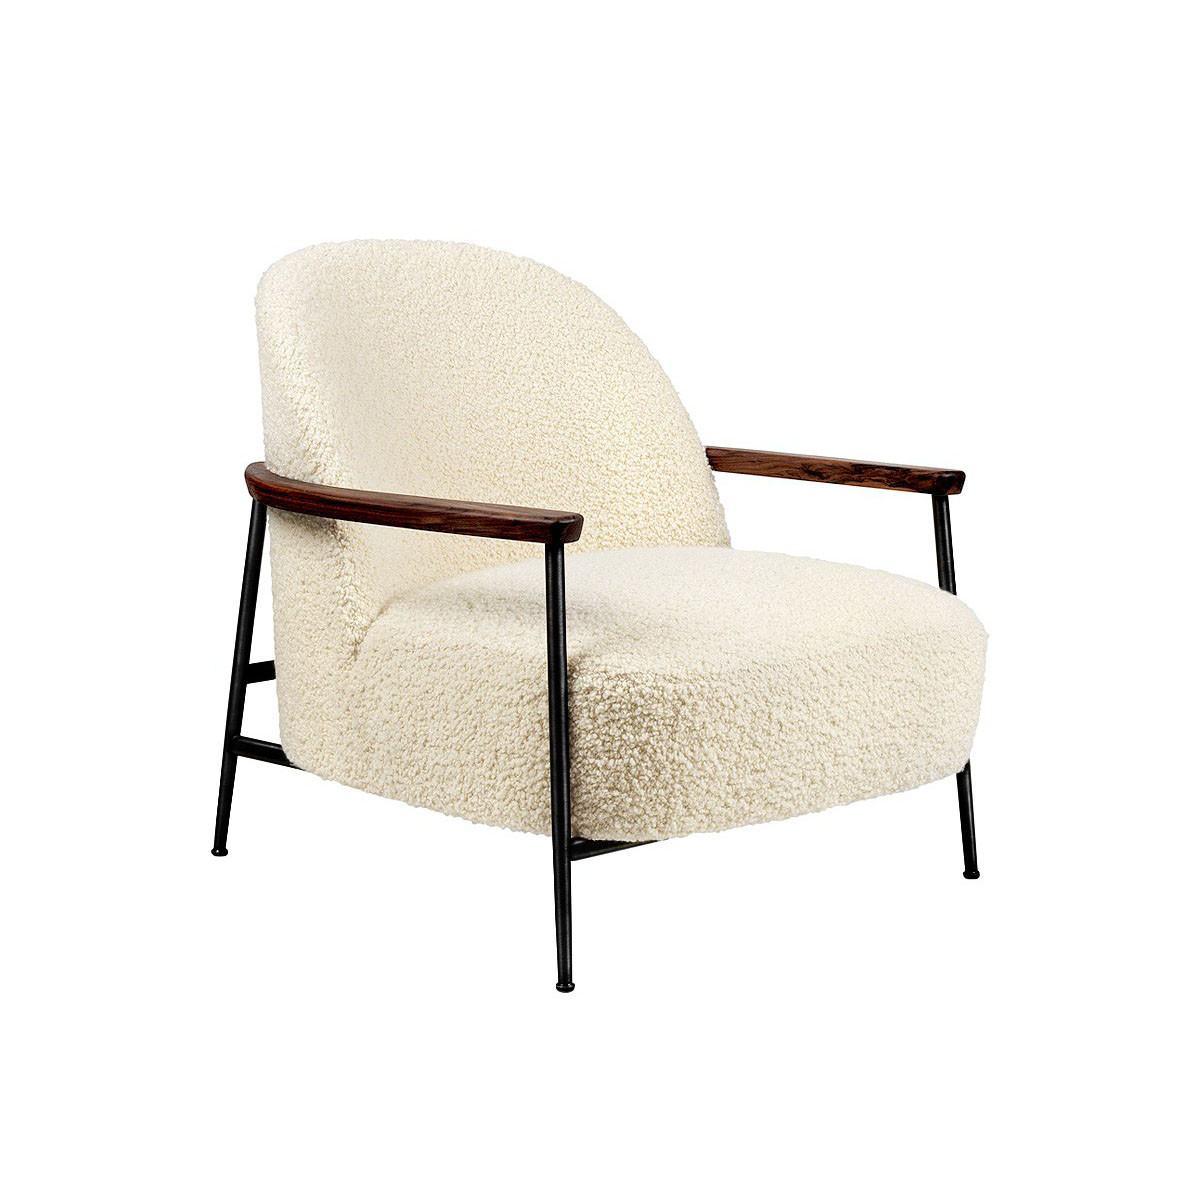 Gubi Sejour Lounge Armchair - Black Base